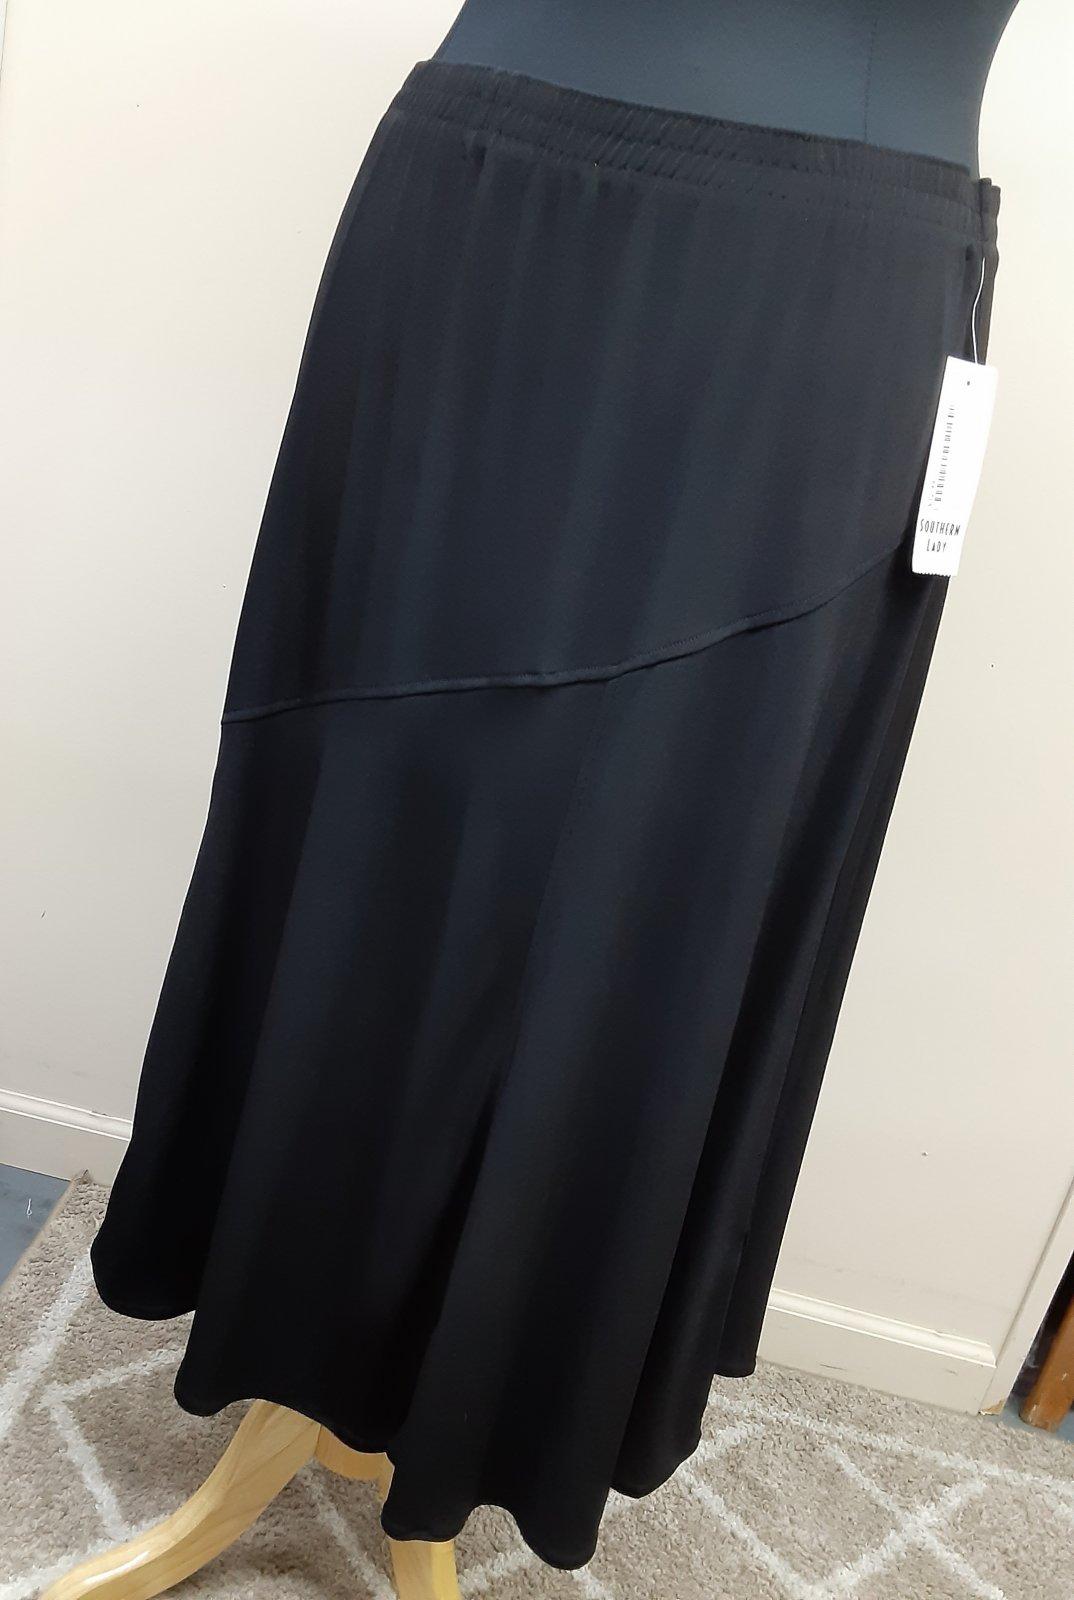 Plus SL A-line Black Skirt w/diagonal seam